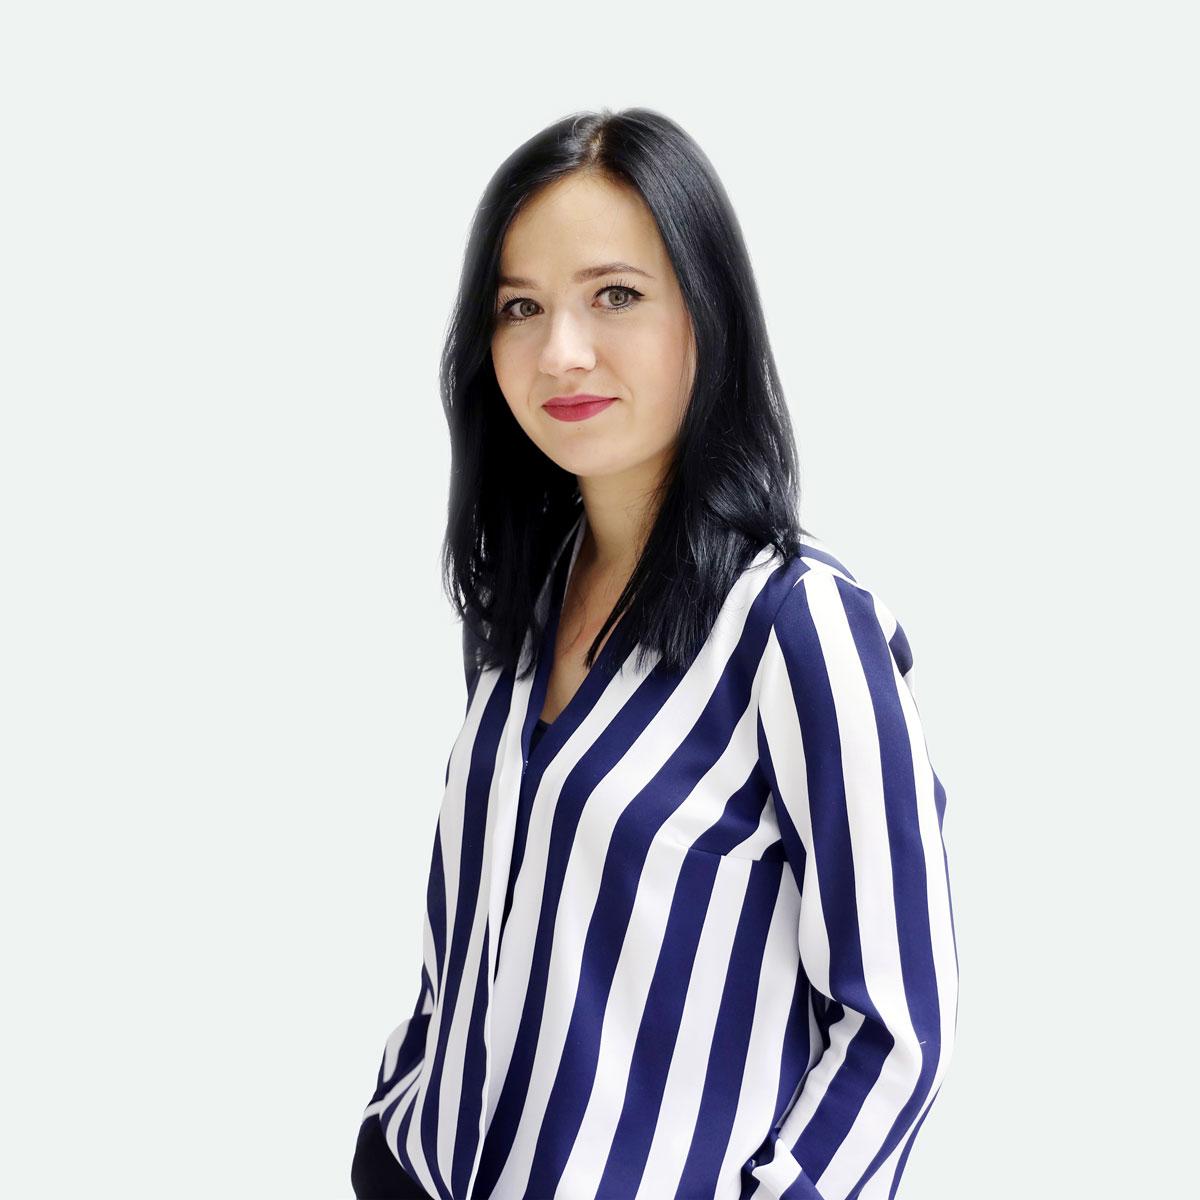 Karolina Majchrowska